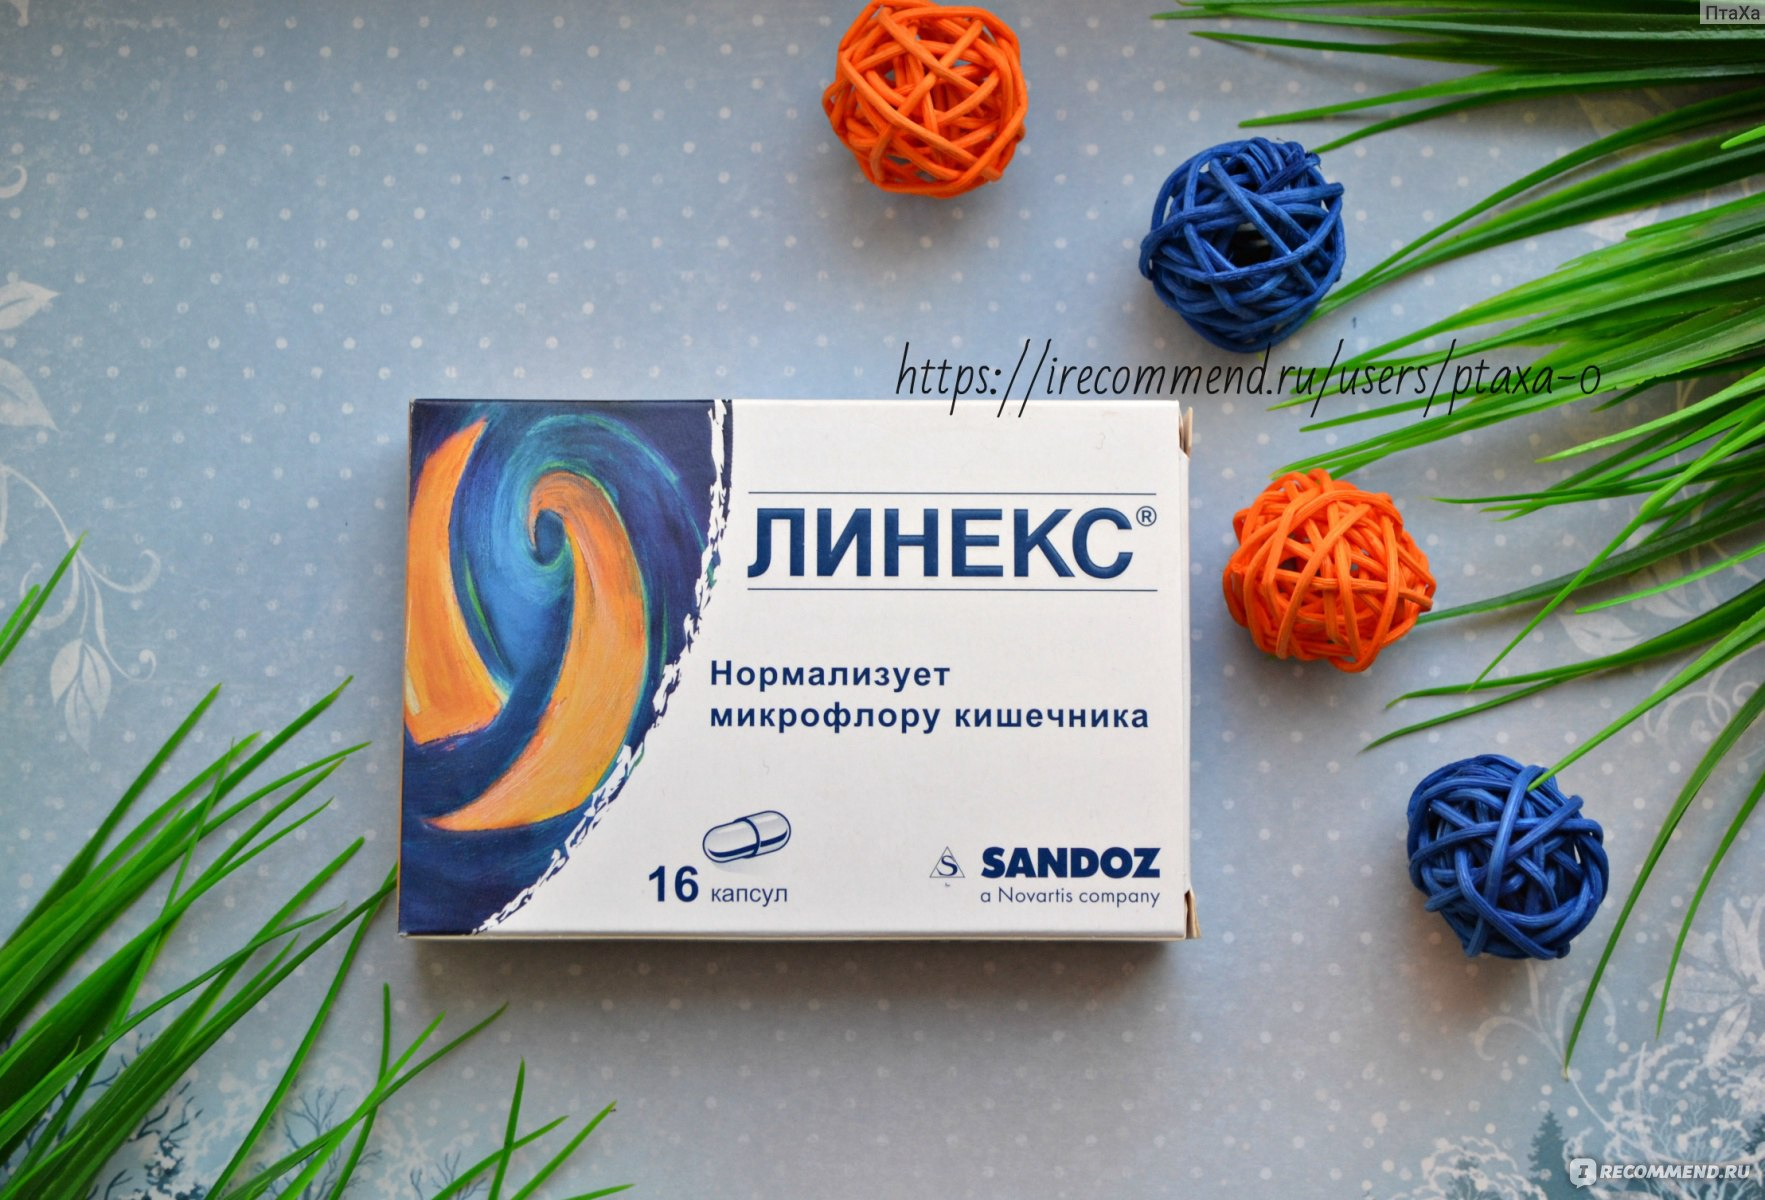 The medicine Bifiliz